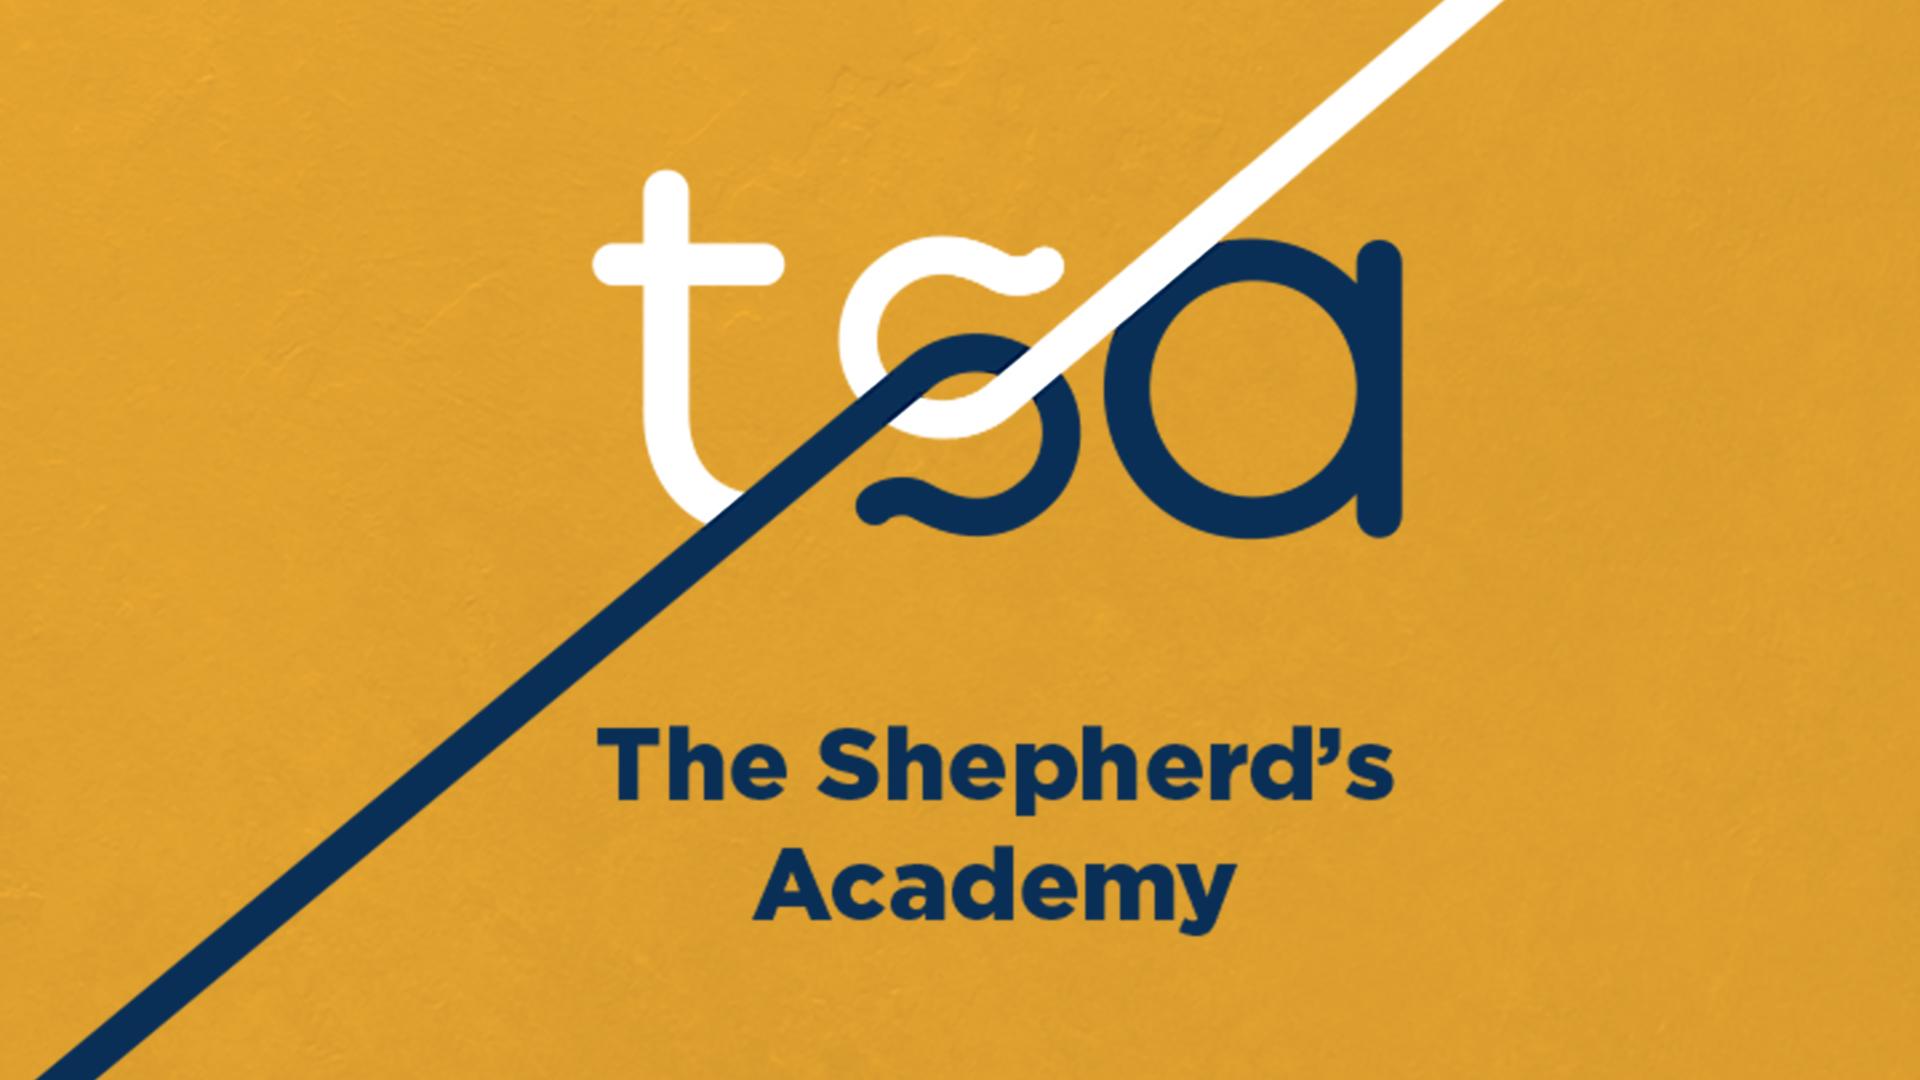 The Shepherd's Academy Annoucment